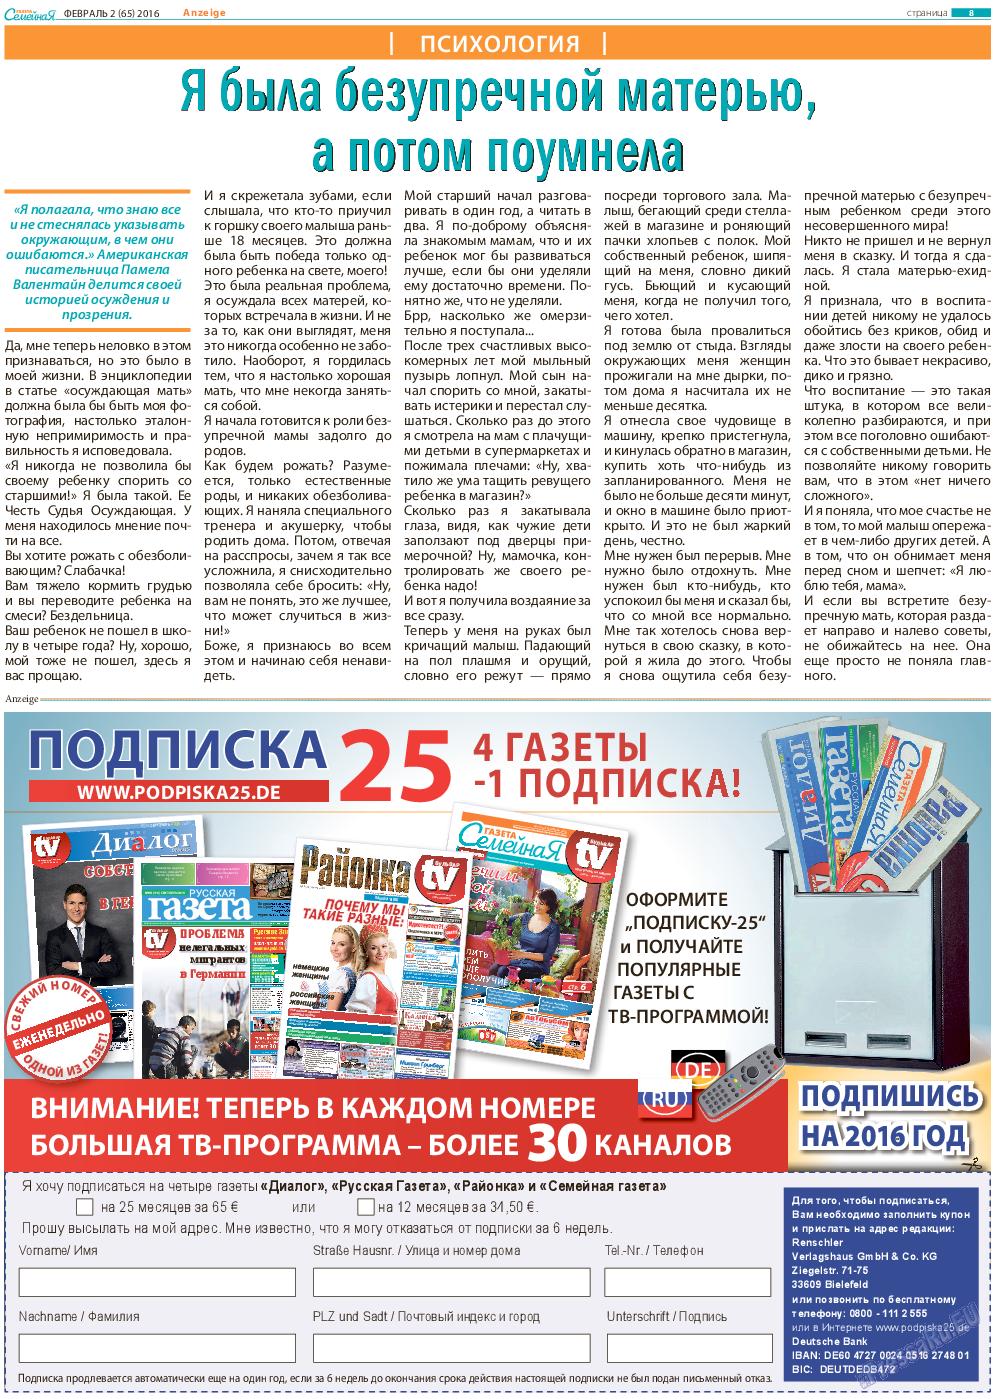 Семейная газета (газета). 2016 год, номер 2, стр. 8